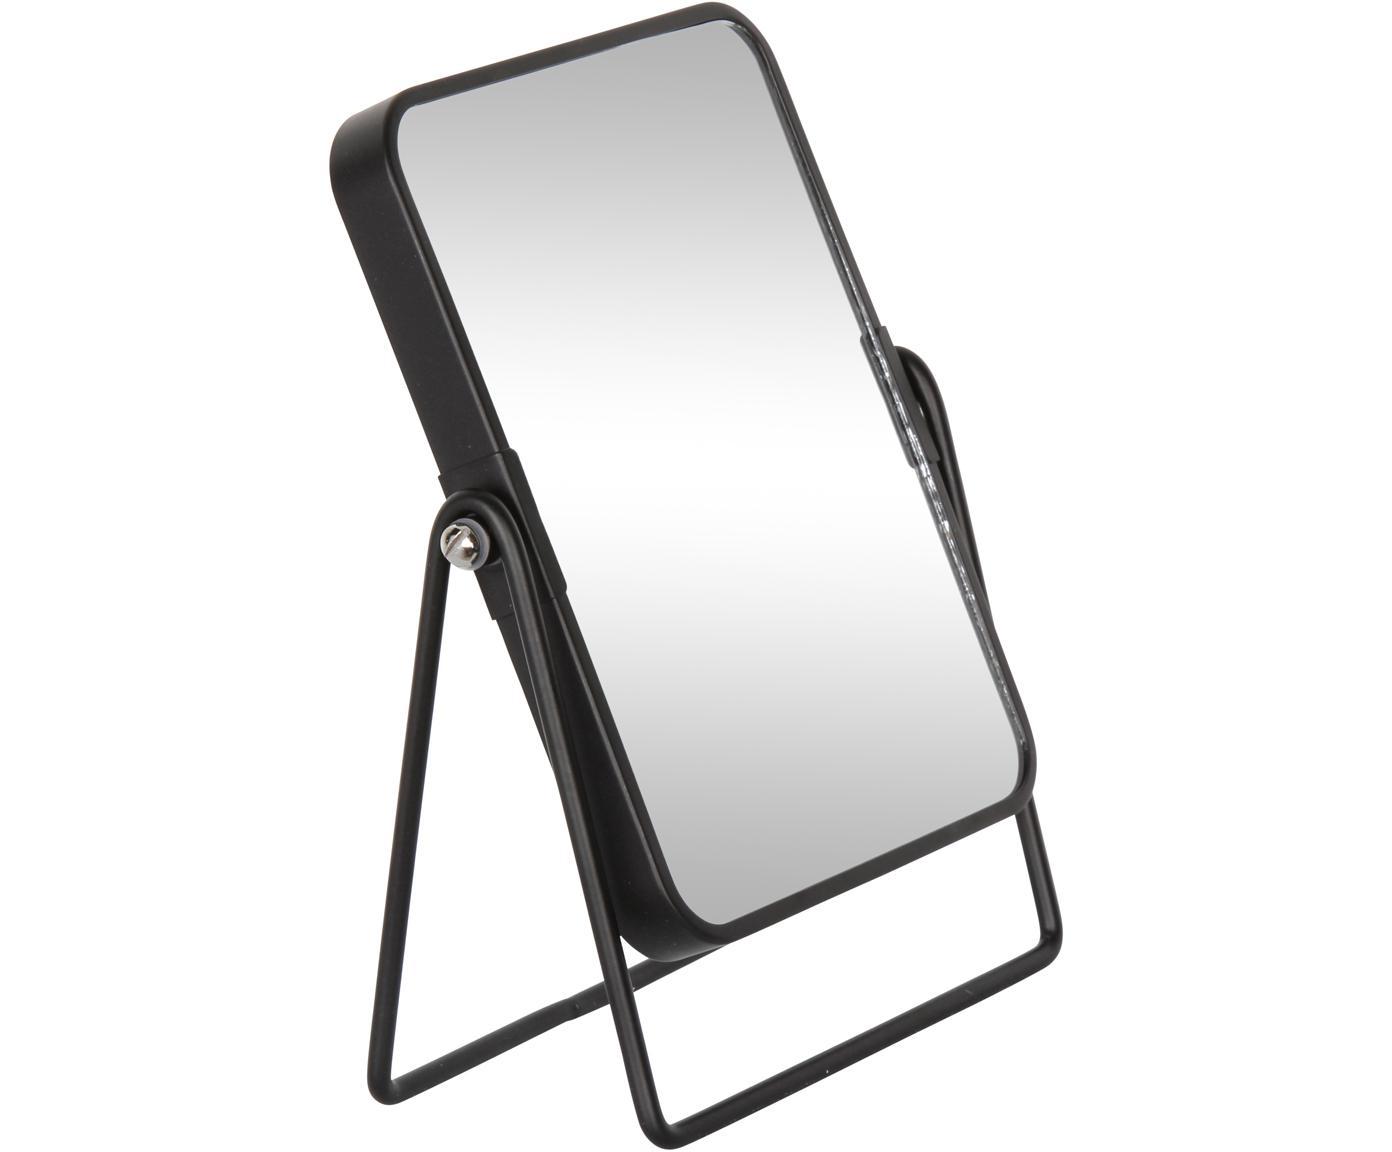 Kosmetikspiegel Doppio, Glas, Metall, Schwarz, Spiegelglas, 16 x 21 cm